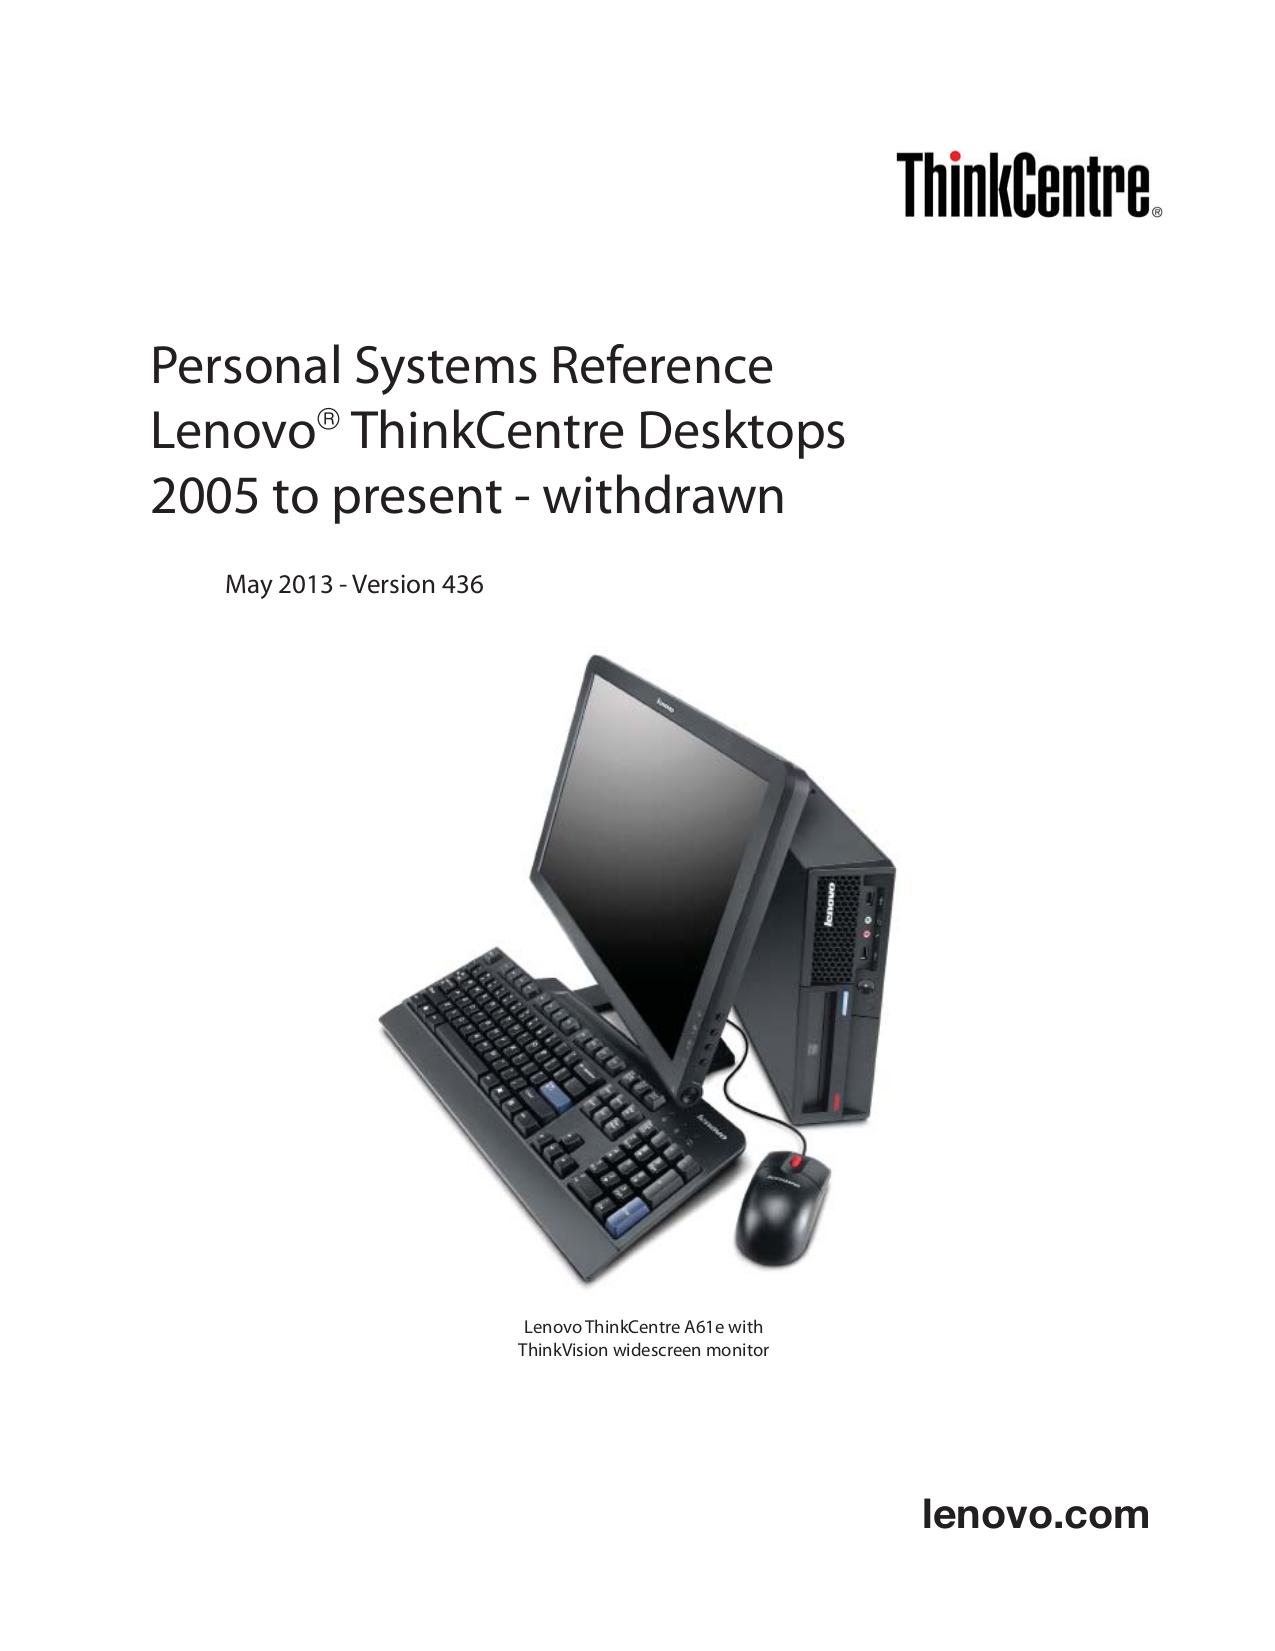 pdf for Lenovo Desktop ThinkCentre M55e 9645 manual